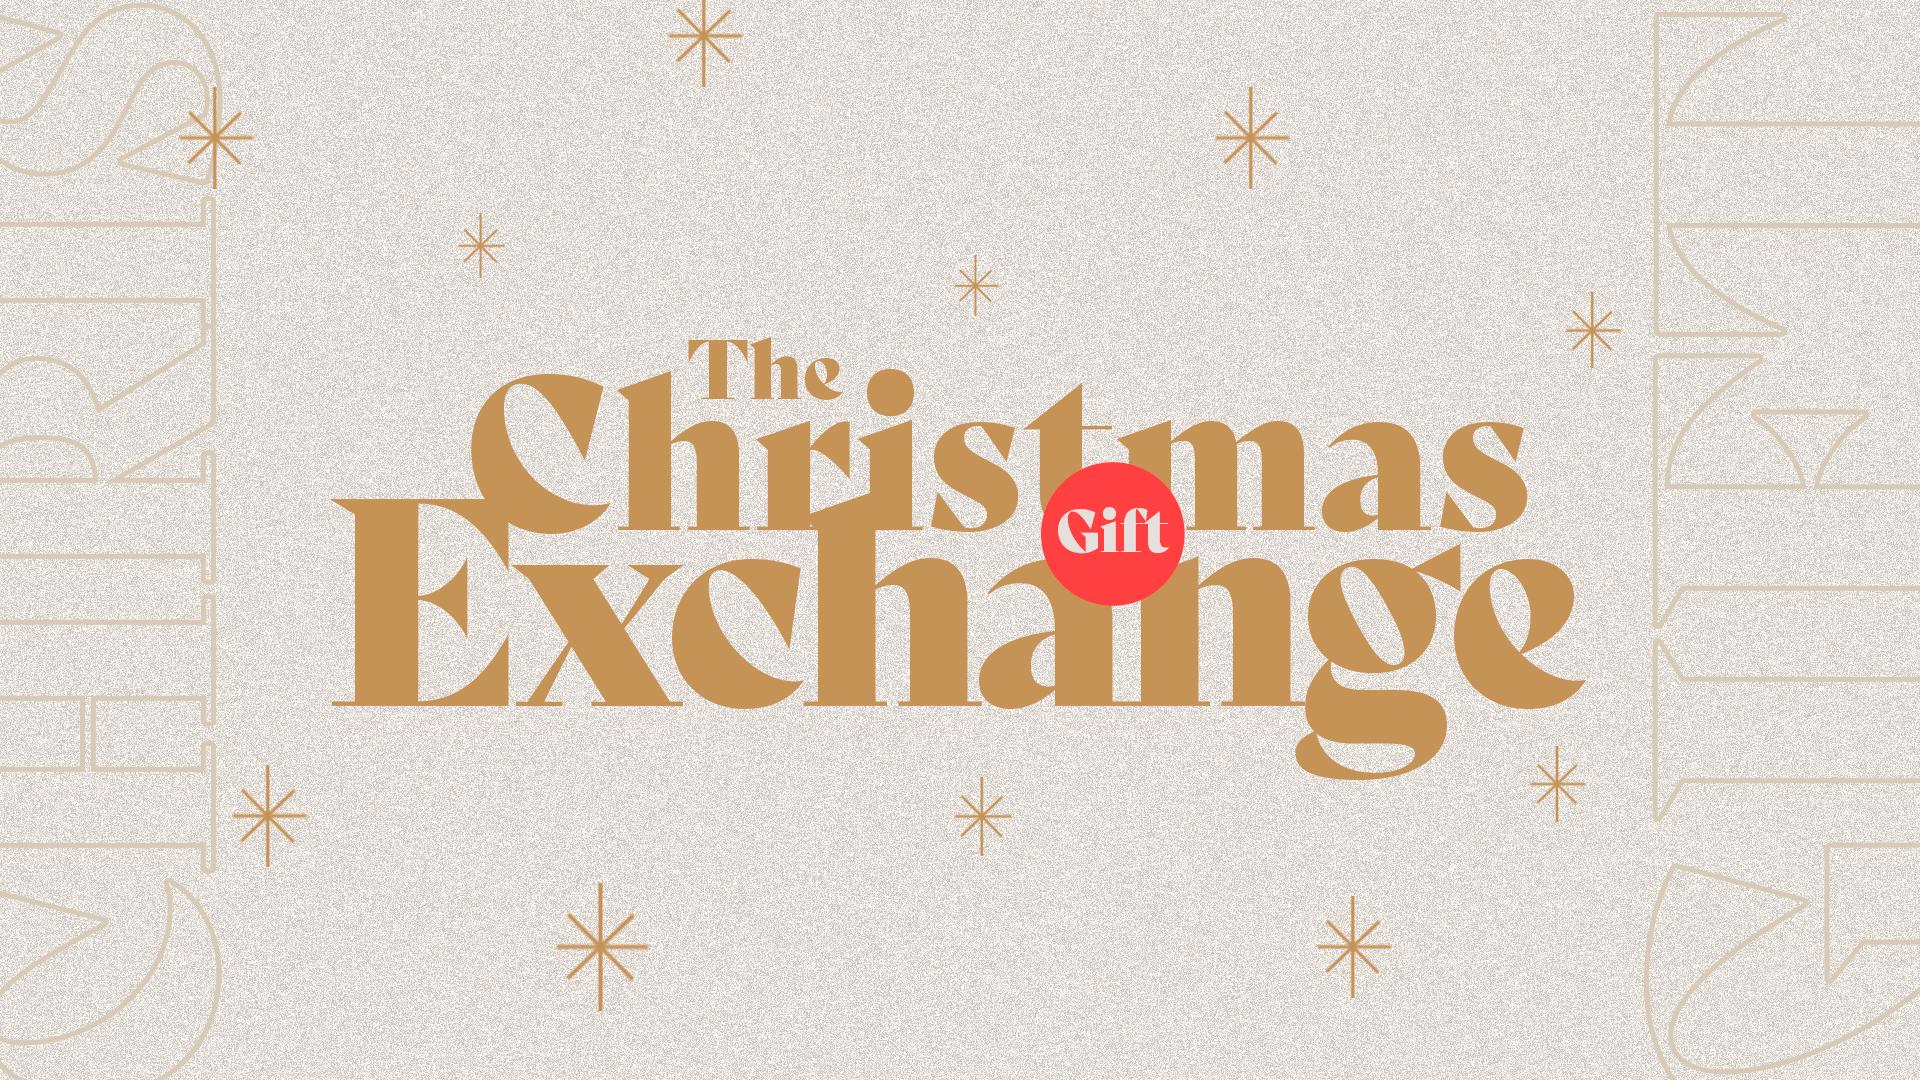 The Christmas Gift Exchange Pt1 - Audio